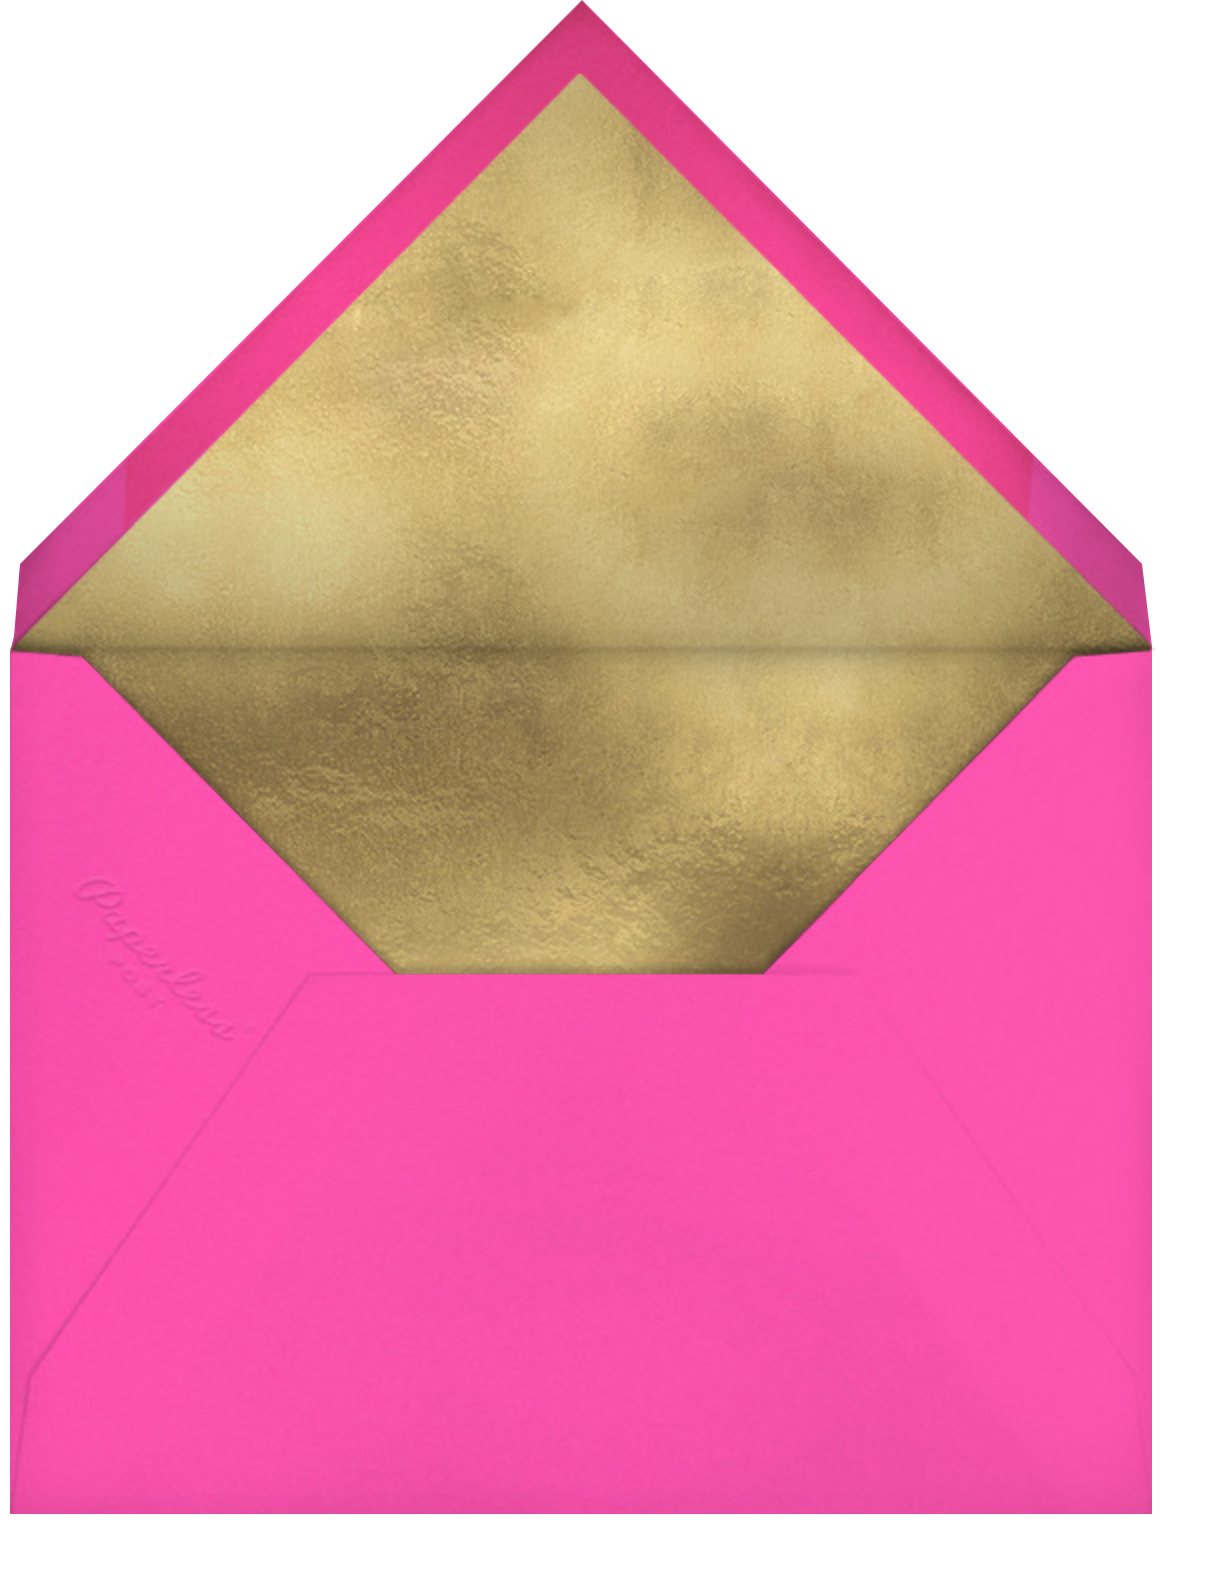 Dvaar (Save the Date) - Schiaparelli - Paperless Post - Save the date - envelope back